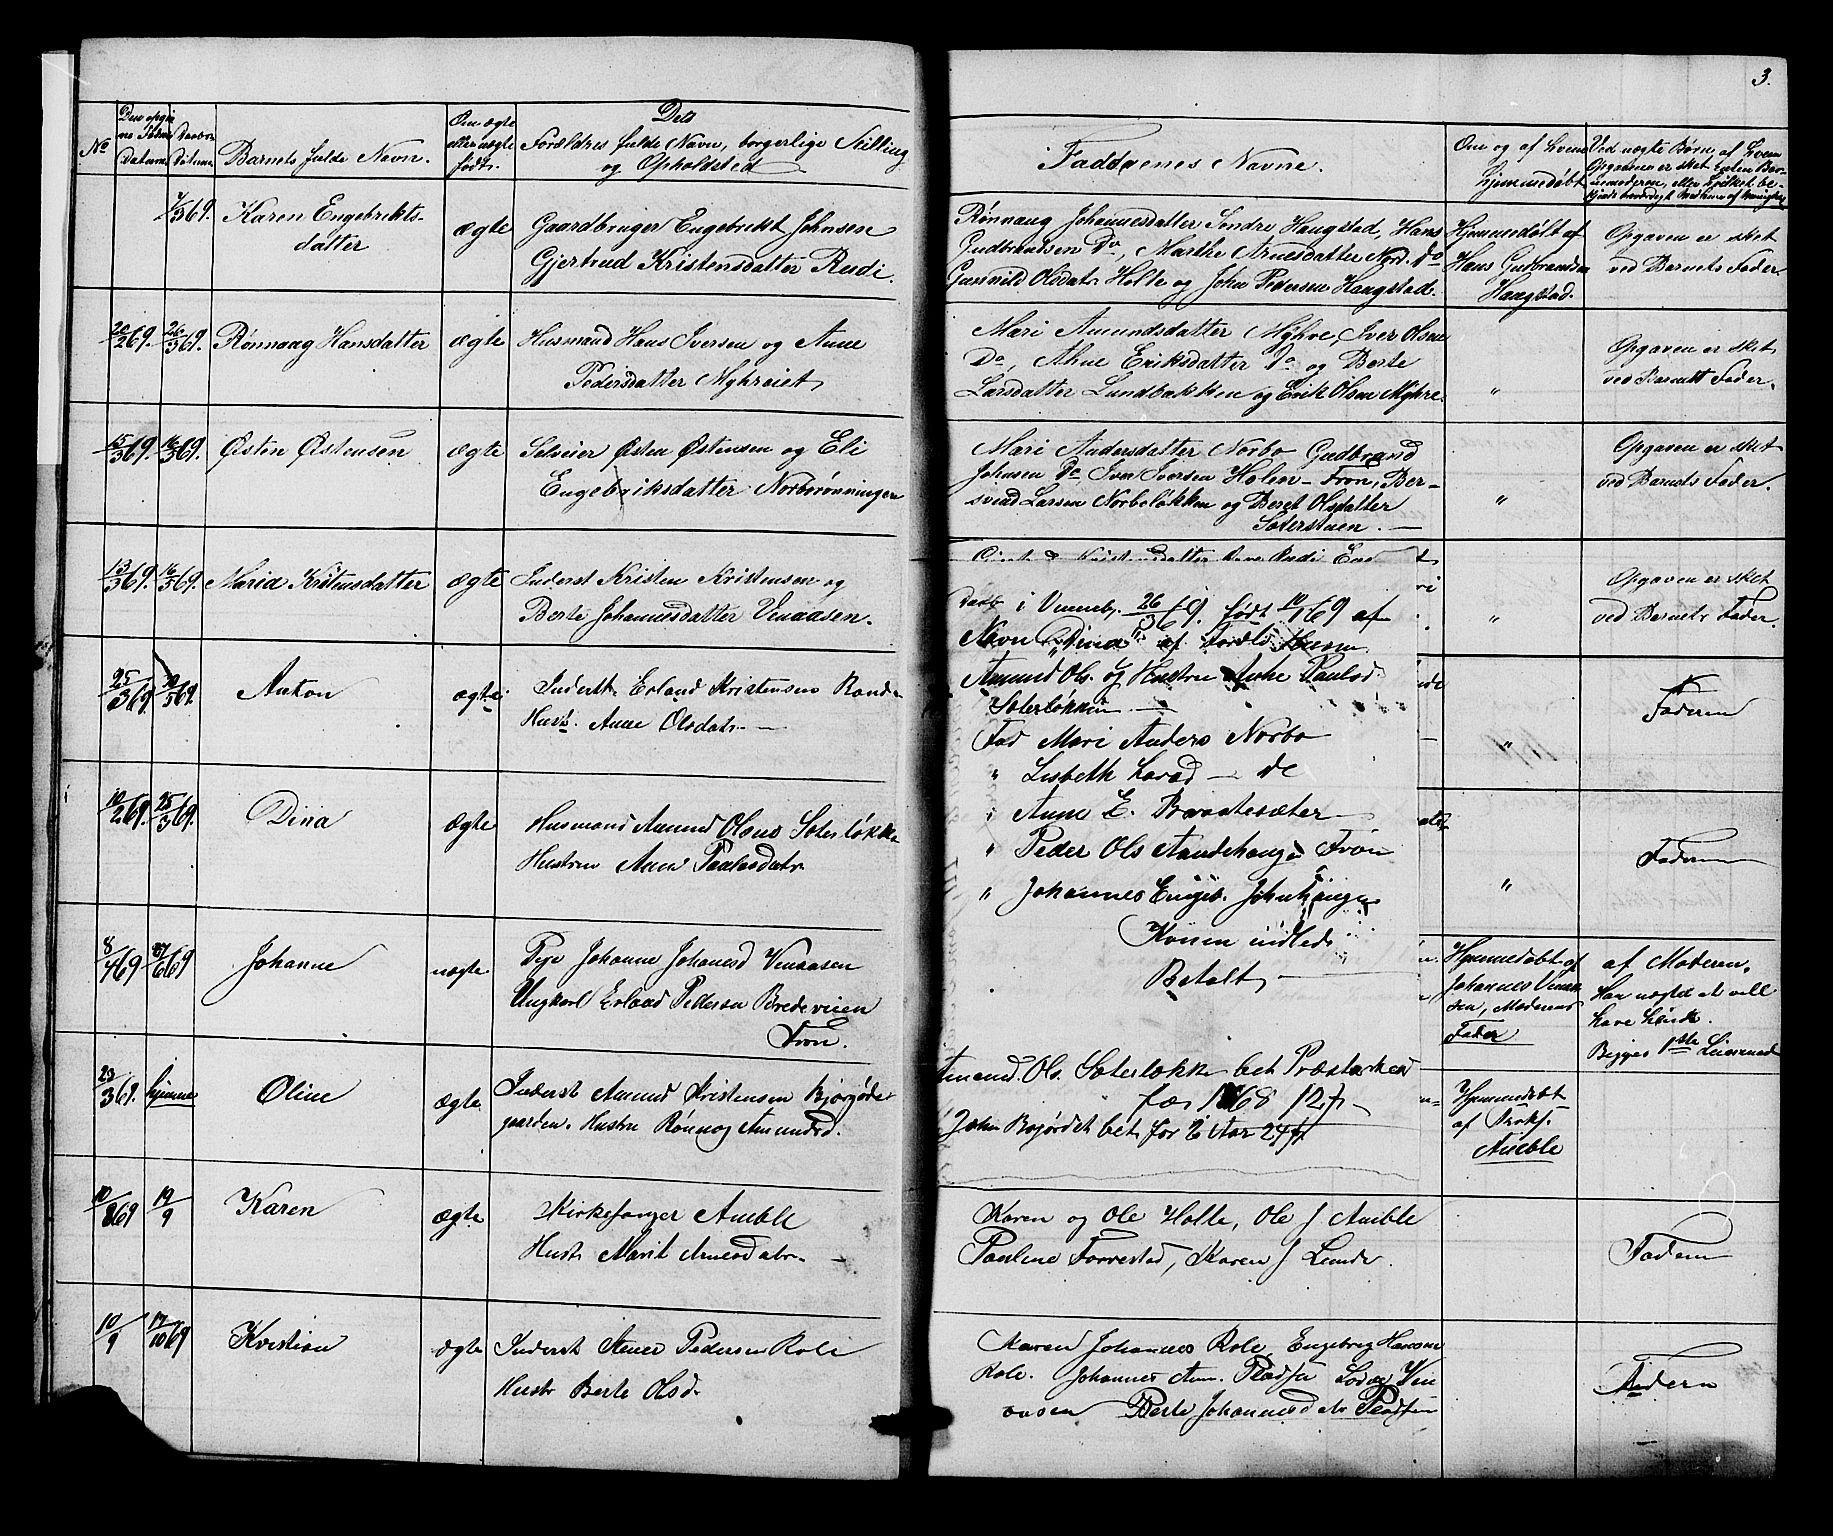 SAH, Ringebu prestekontor, Klokkerbok nr. 5, 1868-1870, s. 3